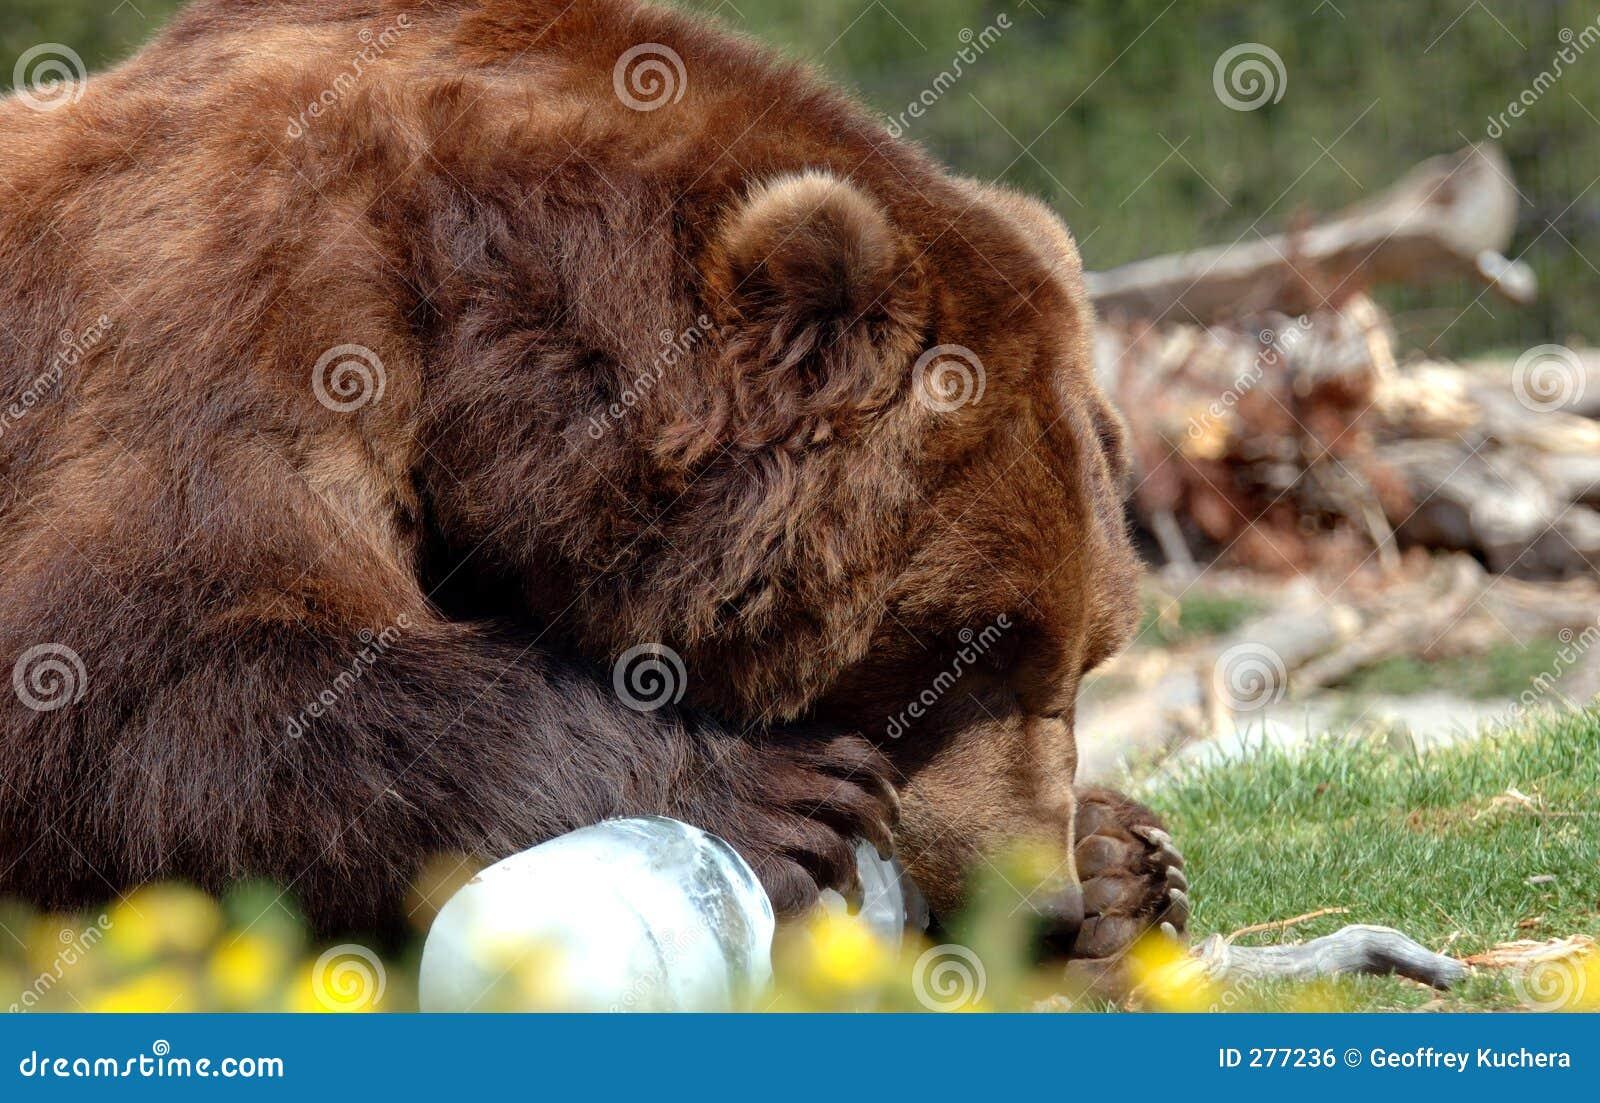 För tuggagrizzly för björn is